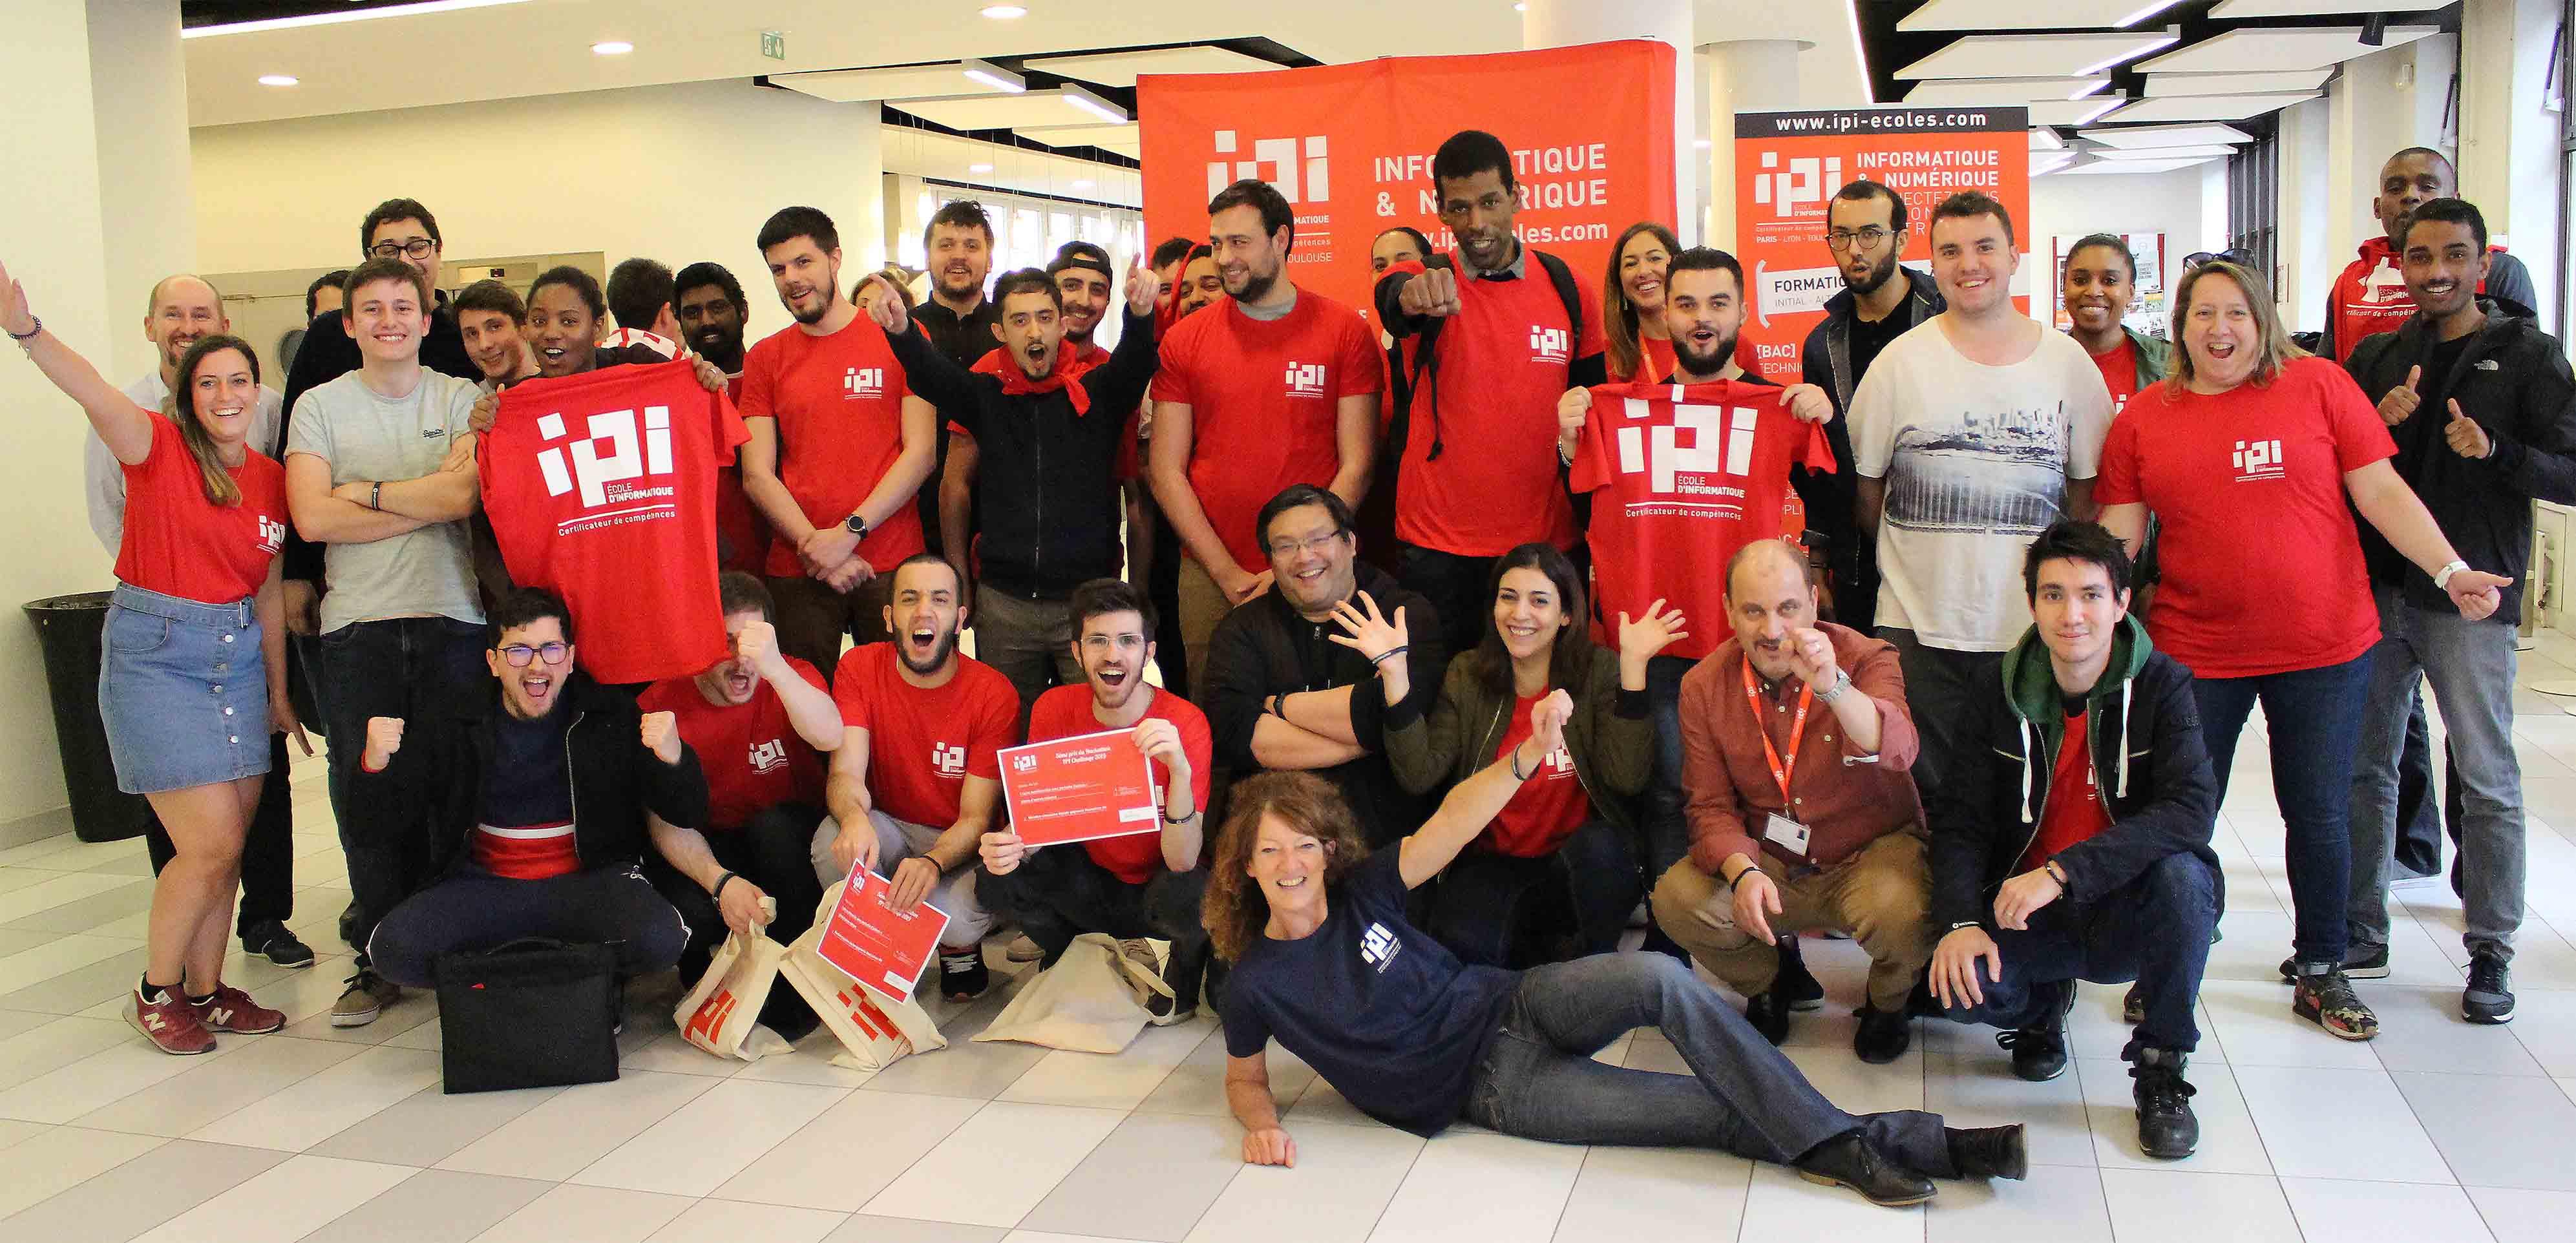 Hackathon IPI Challenge